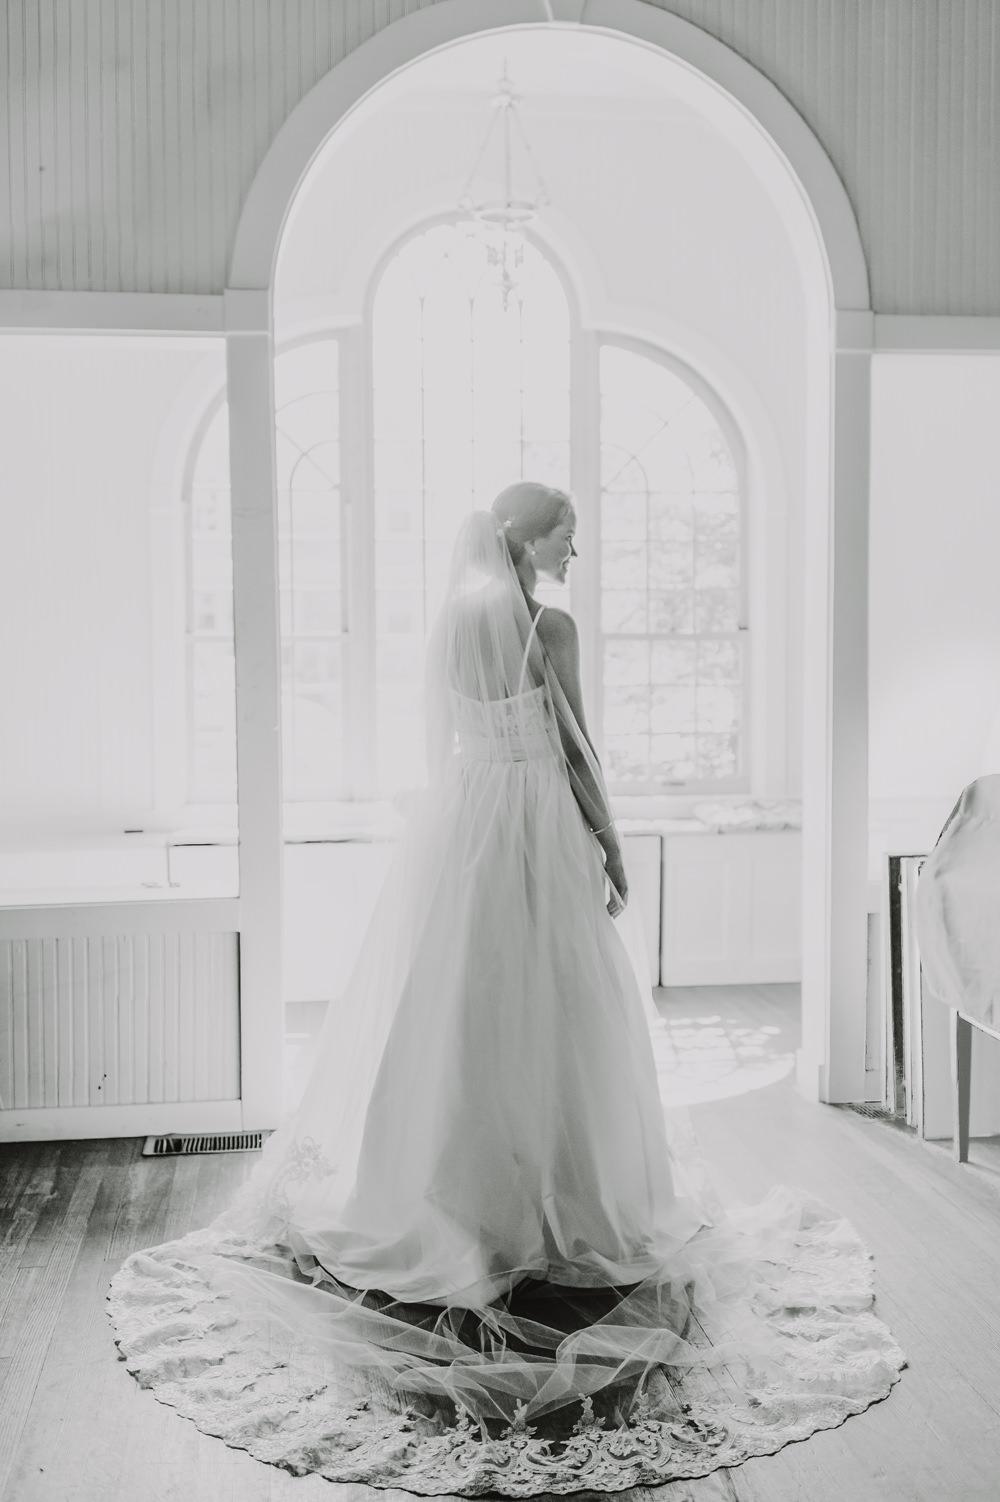 Dress Gown Bride Bridal Princess Straps Veil Train Maryland Wedding L. Hewitt Photography